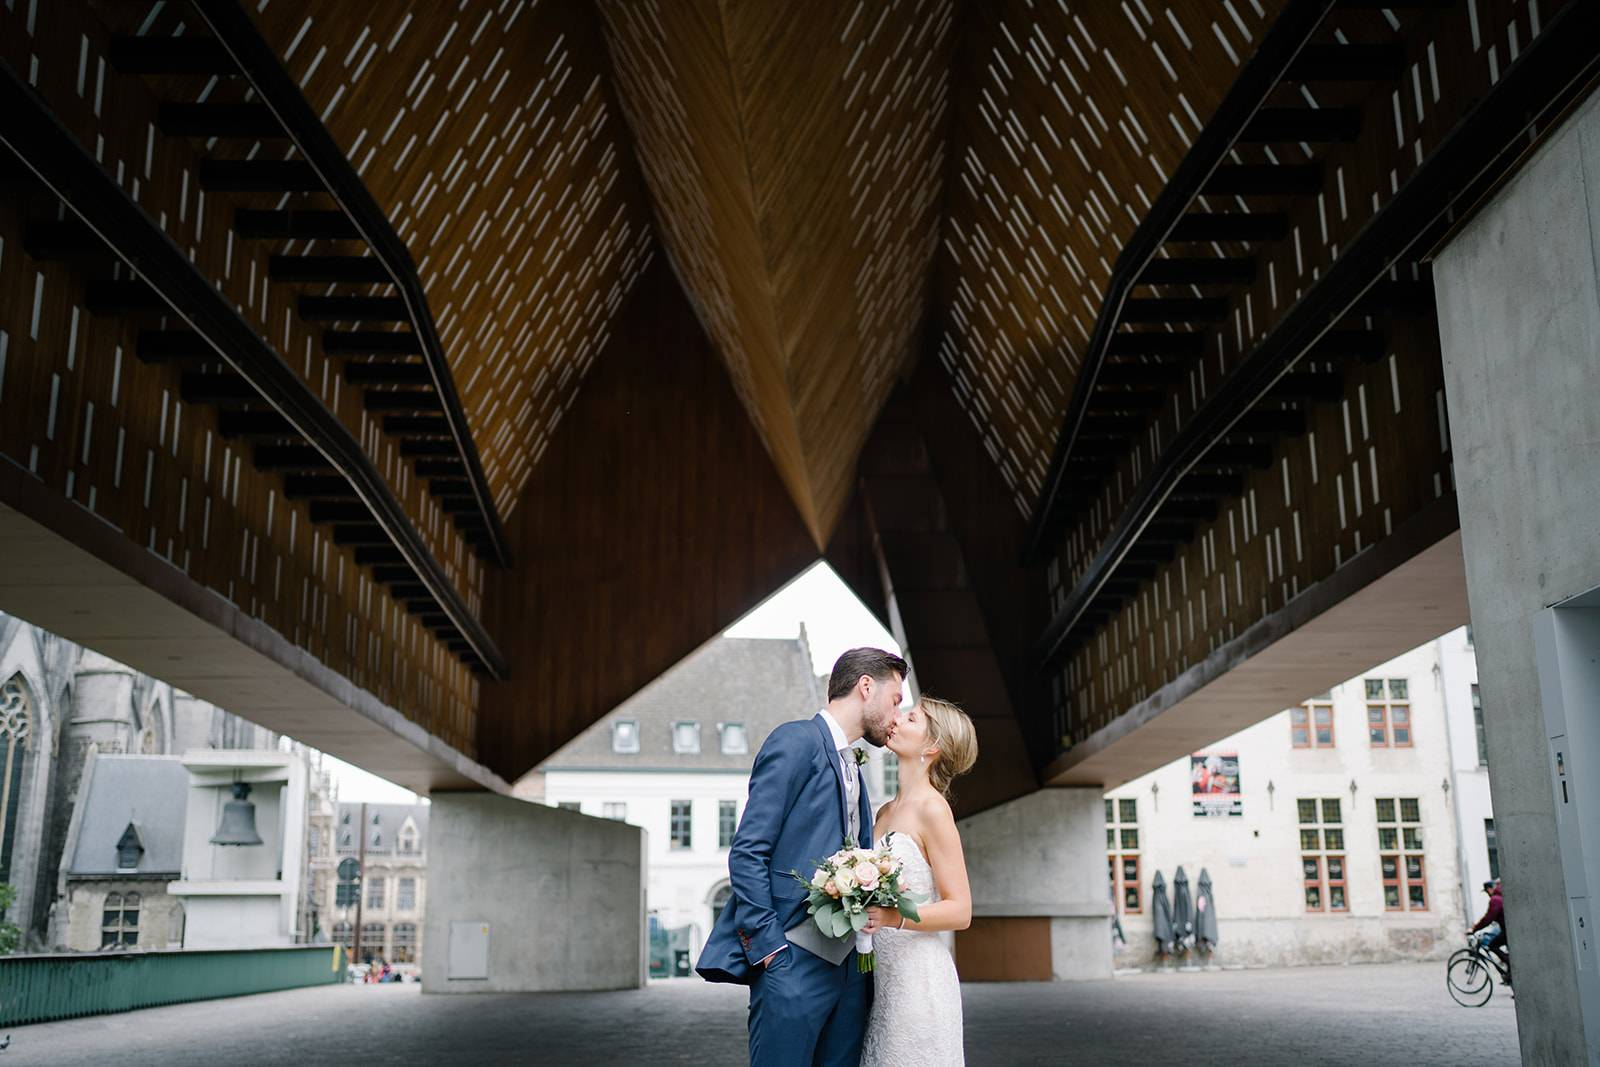 Hilde Eyckmans - AB-468 - House of Weddings